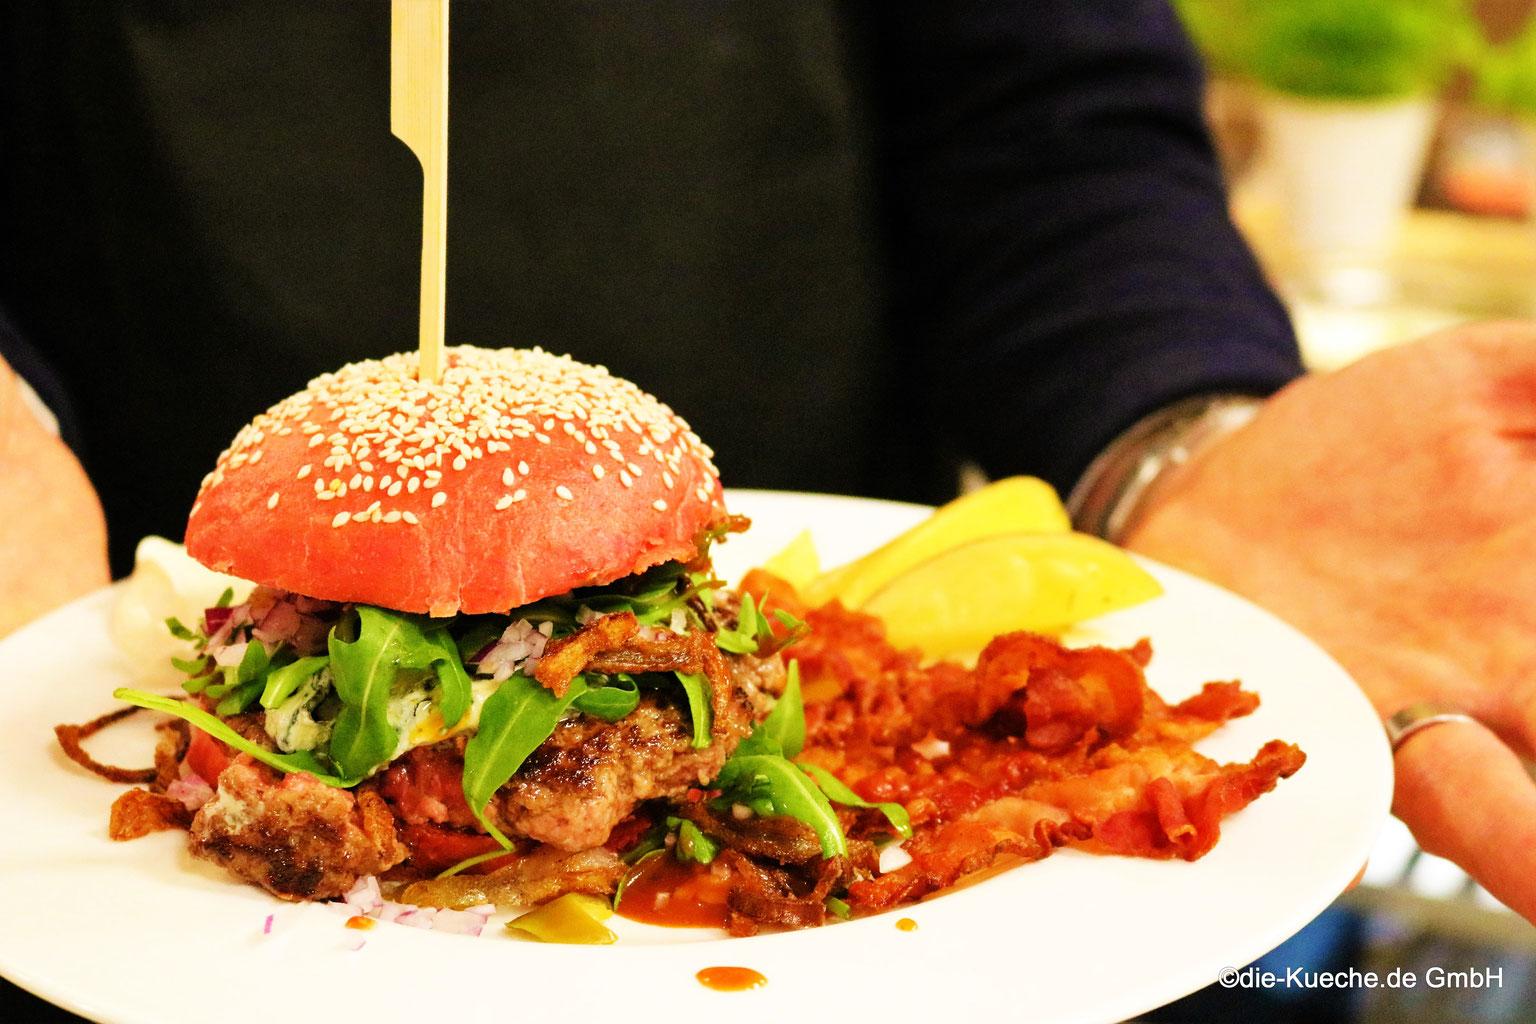 american style burger workshop die k che sonthofen ihr k chenprofi vor ort. Black Bedroom Furniture Sets. Home Design Ideas